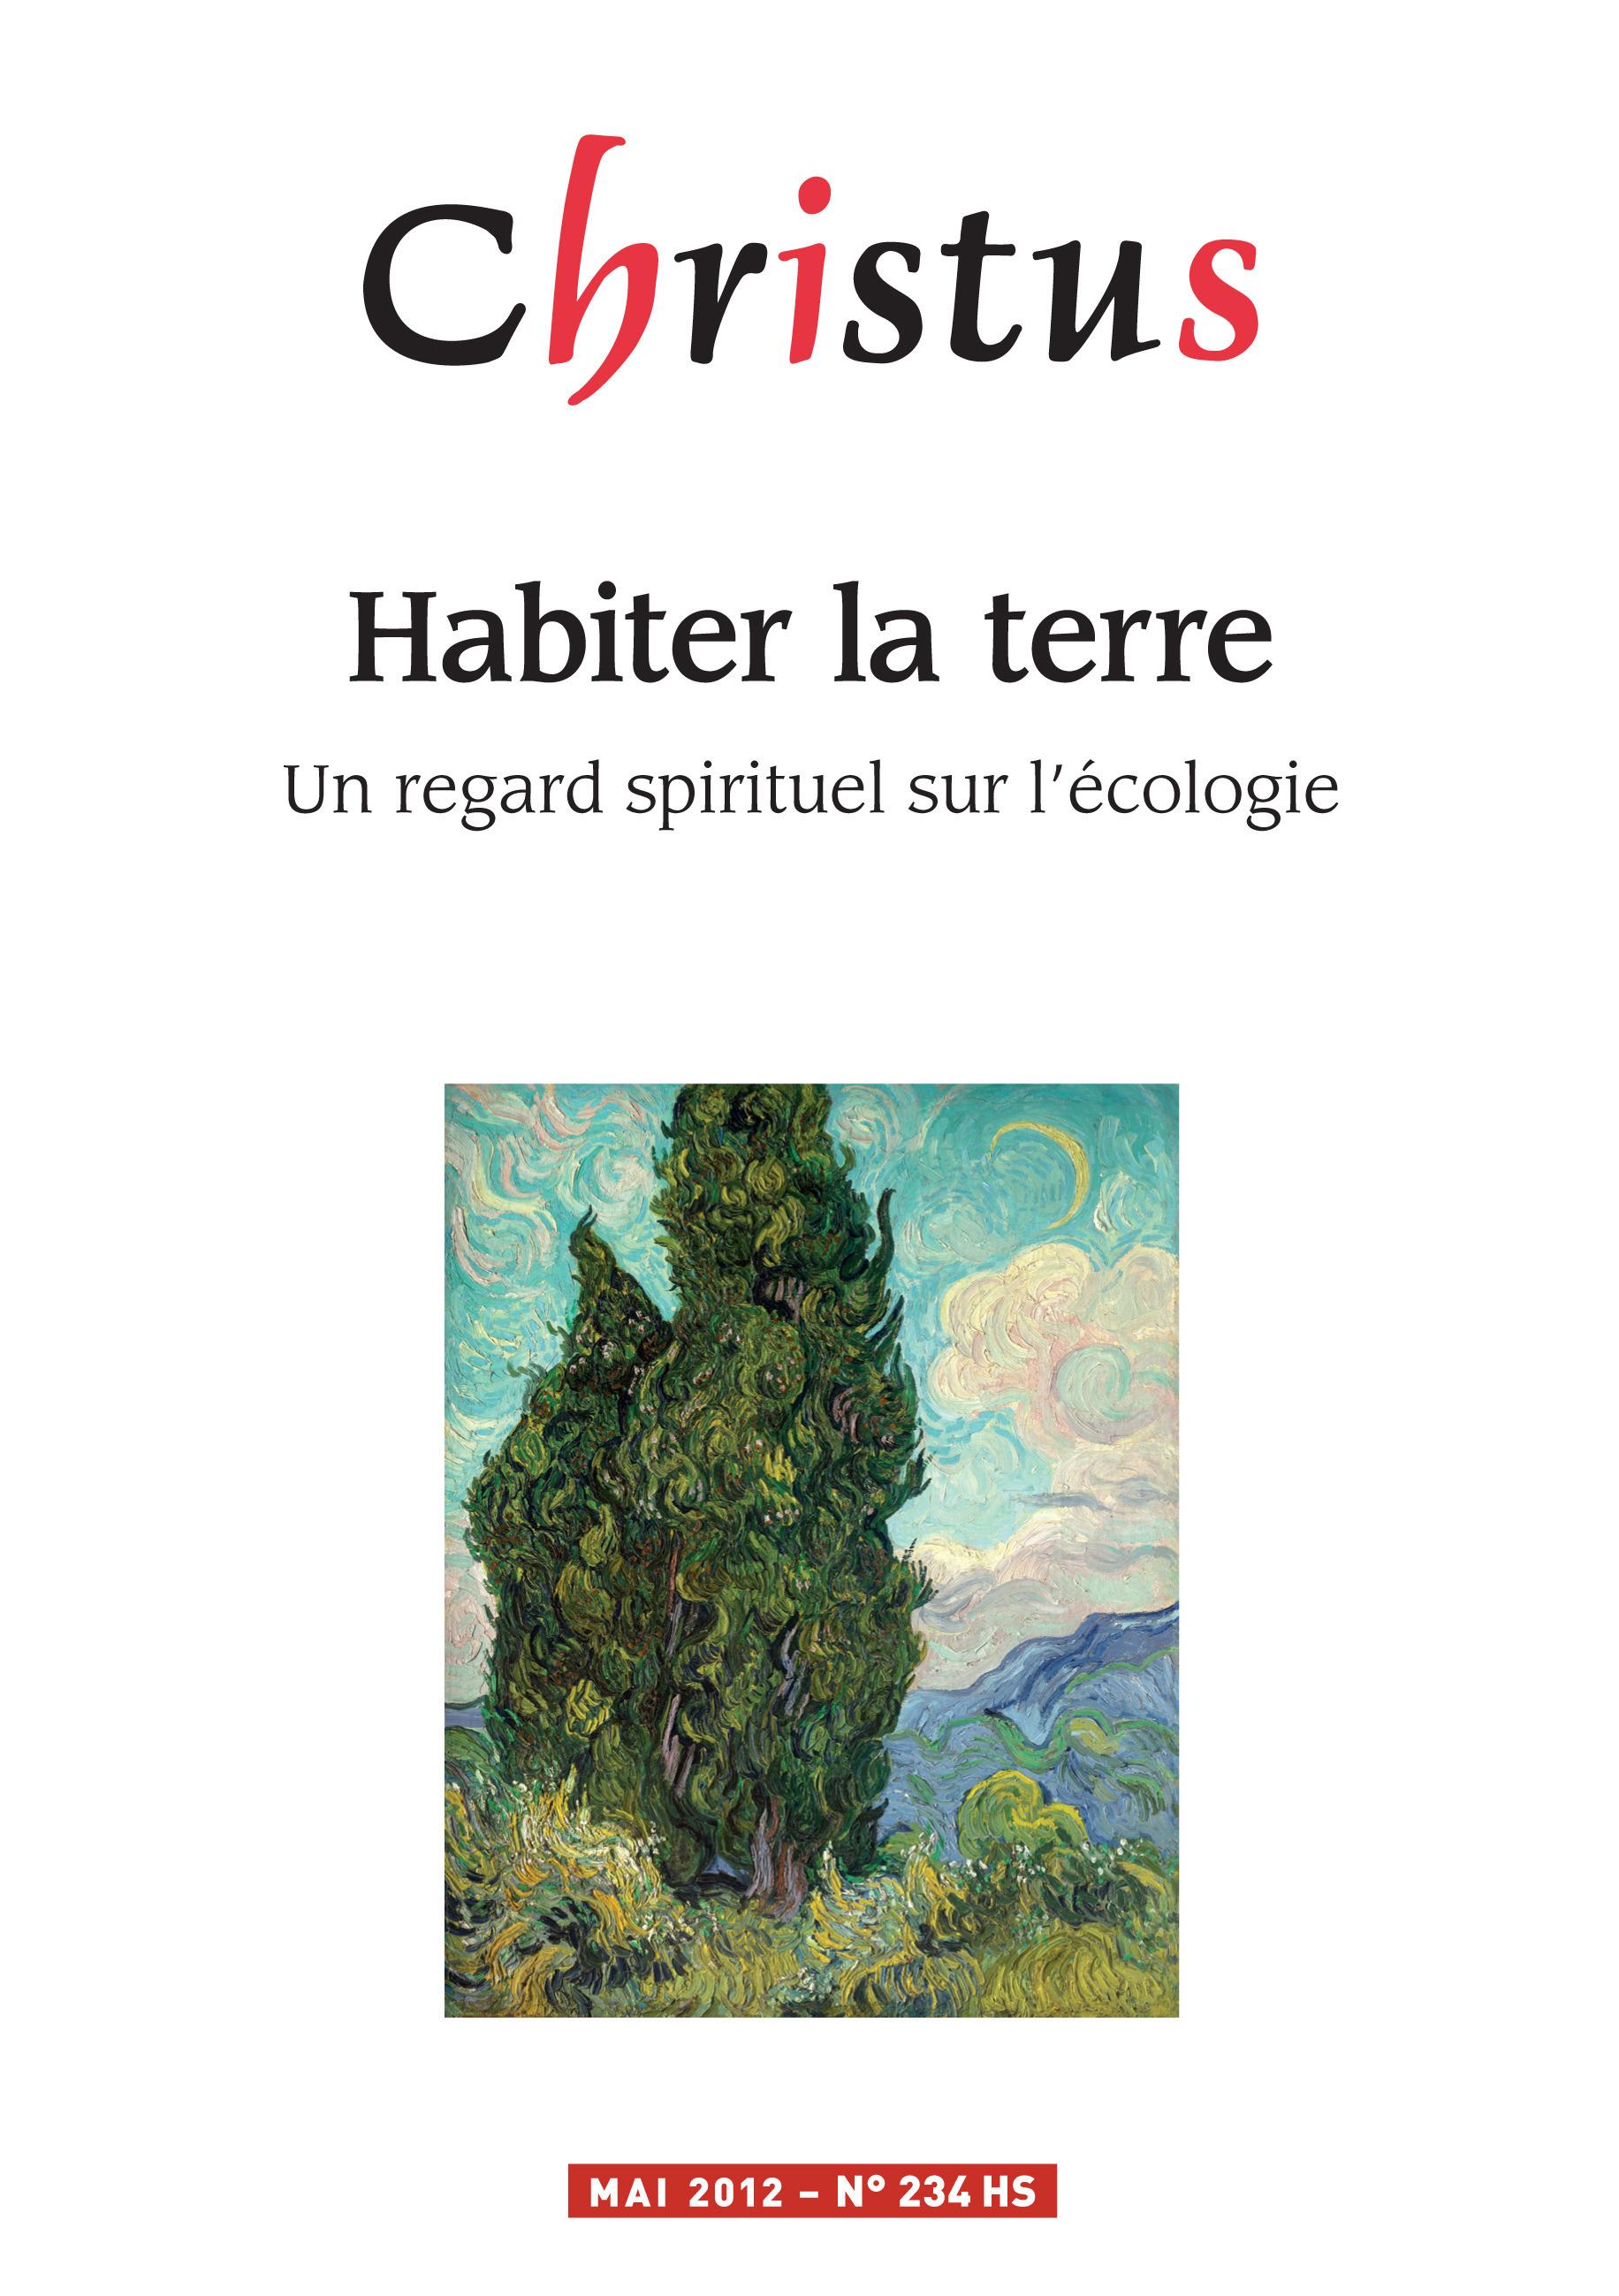 Revue christus ; Christus Hors-Série 2012